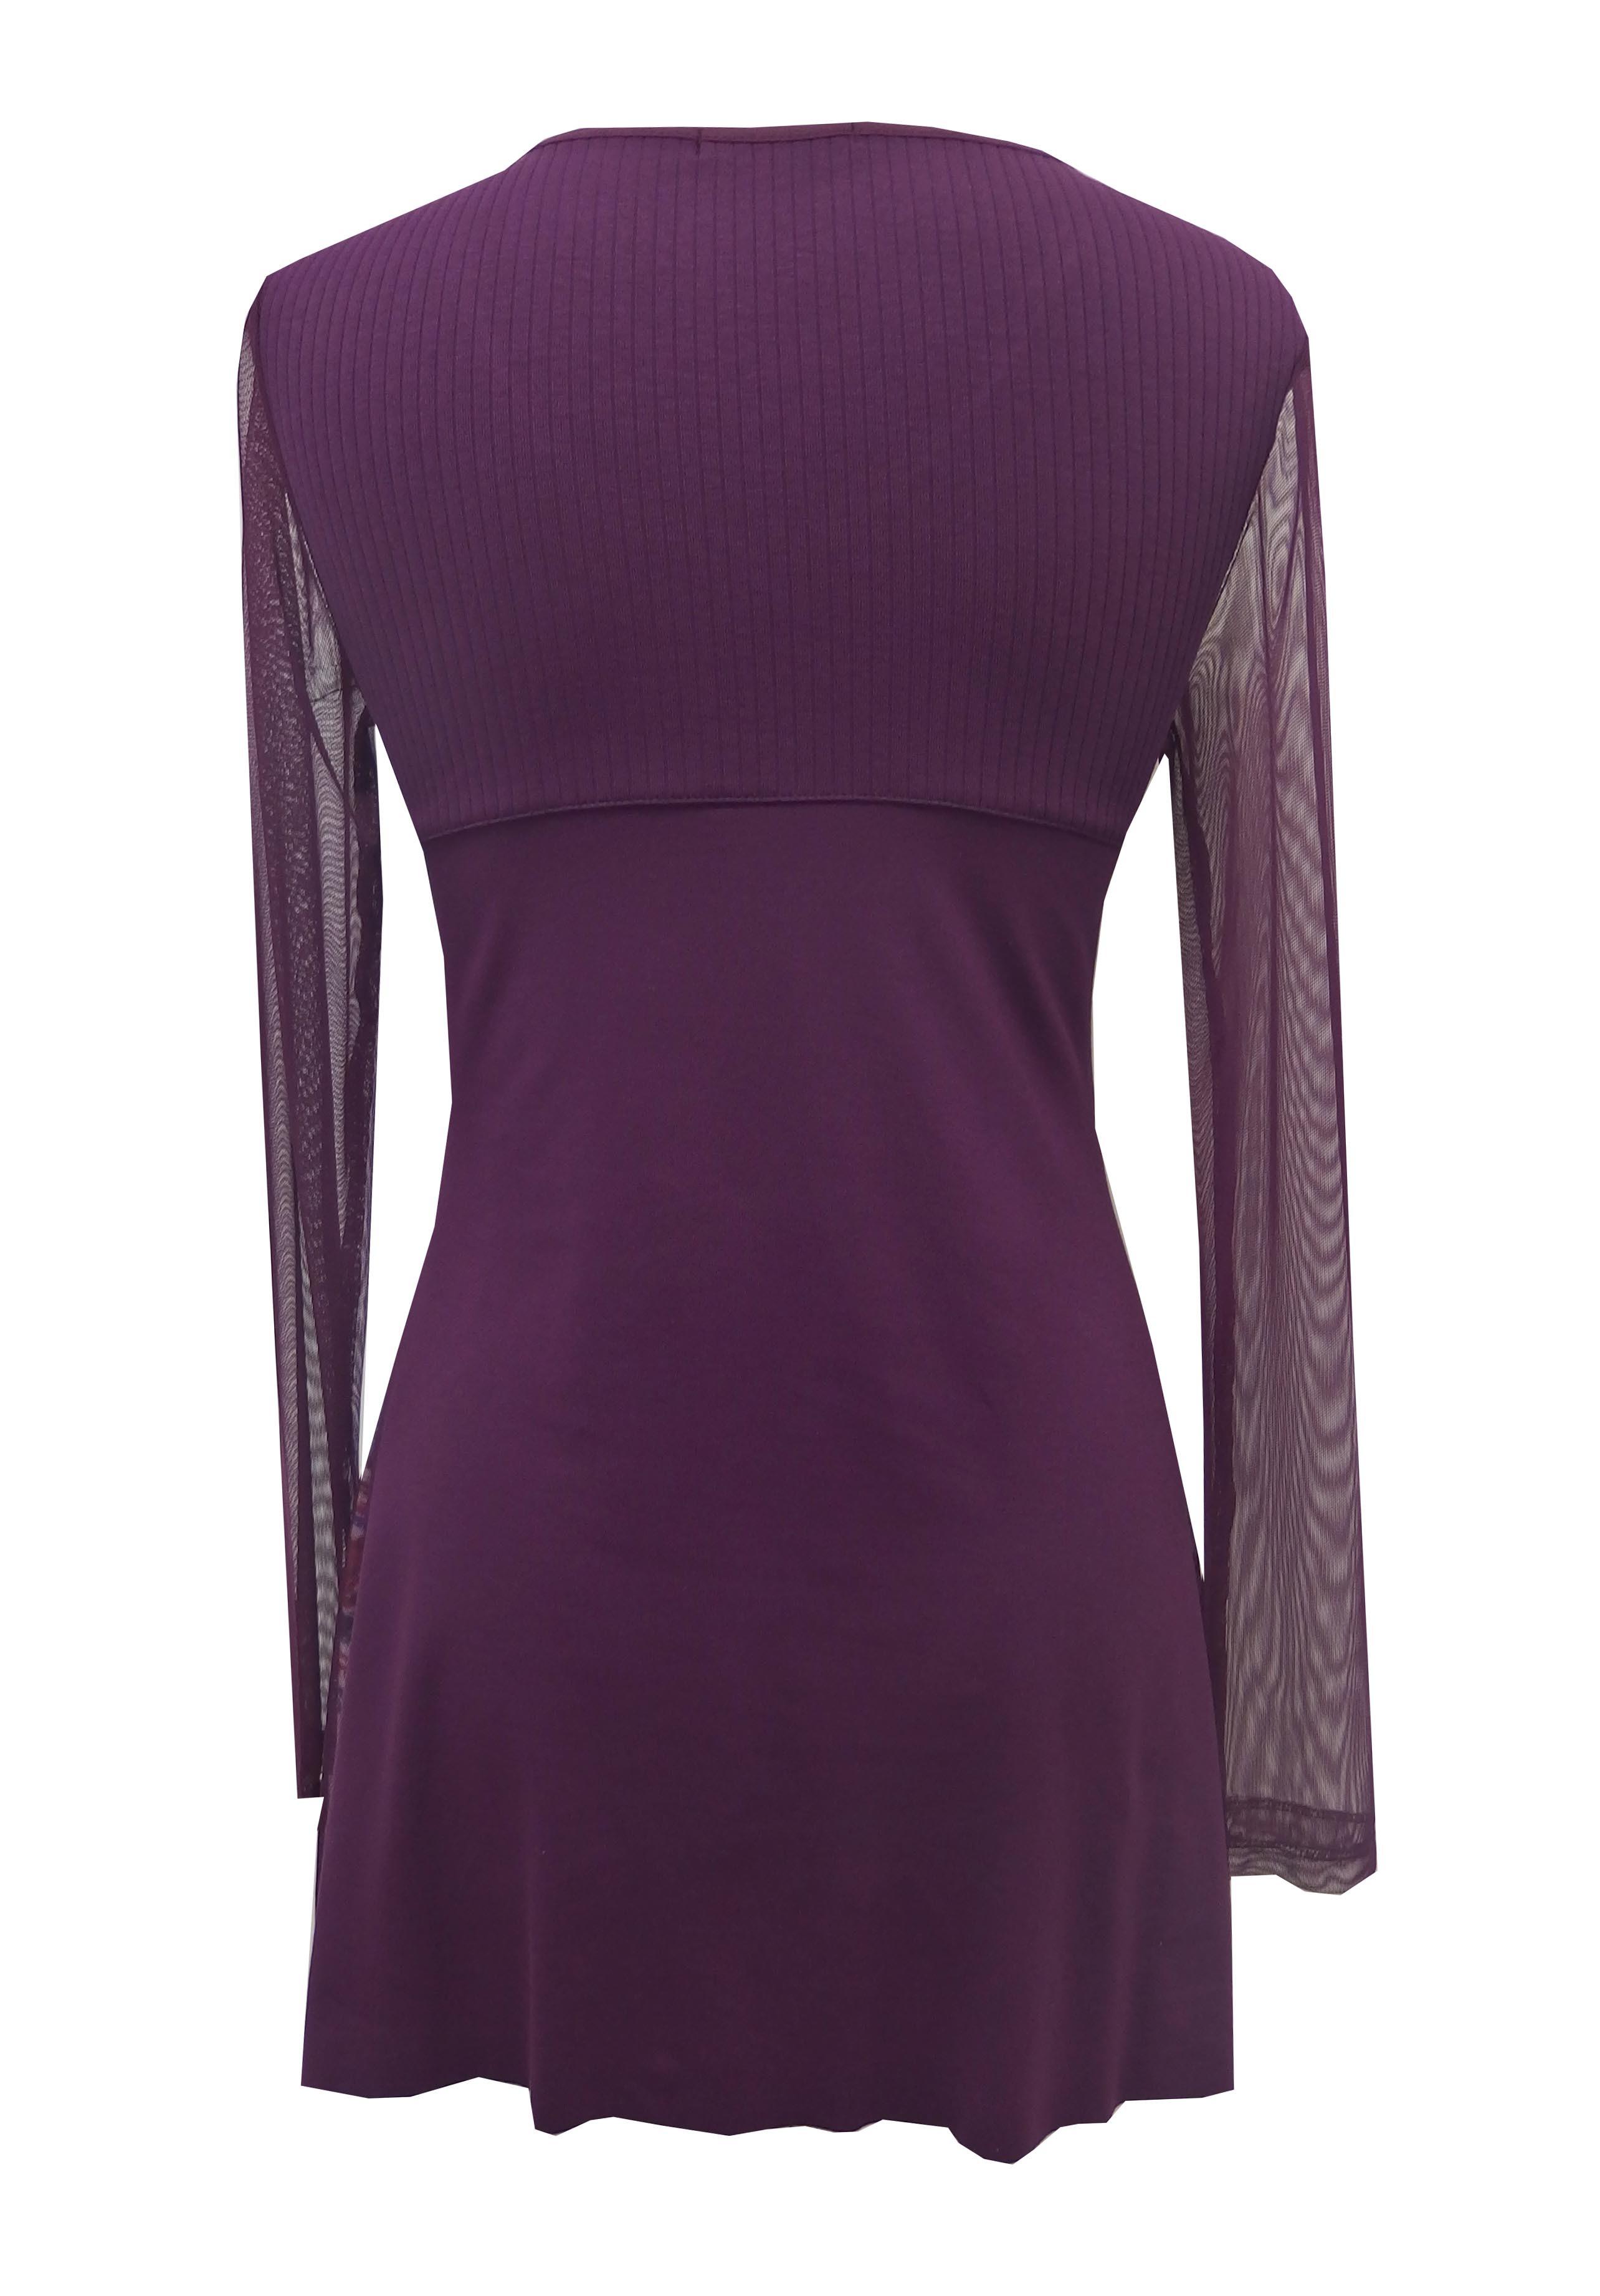 Maloka: Asymmetrical Diamond & Princess Lace Tunic (Only Purple Left)